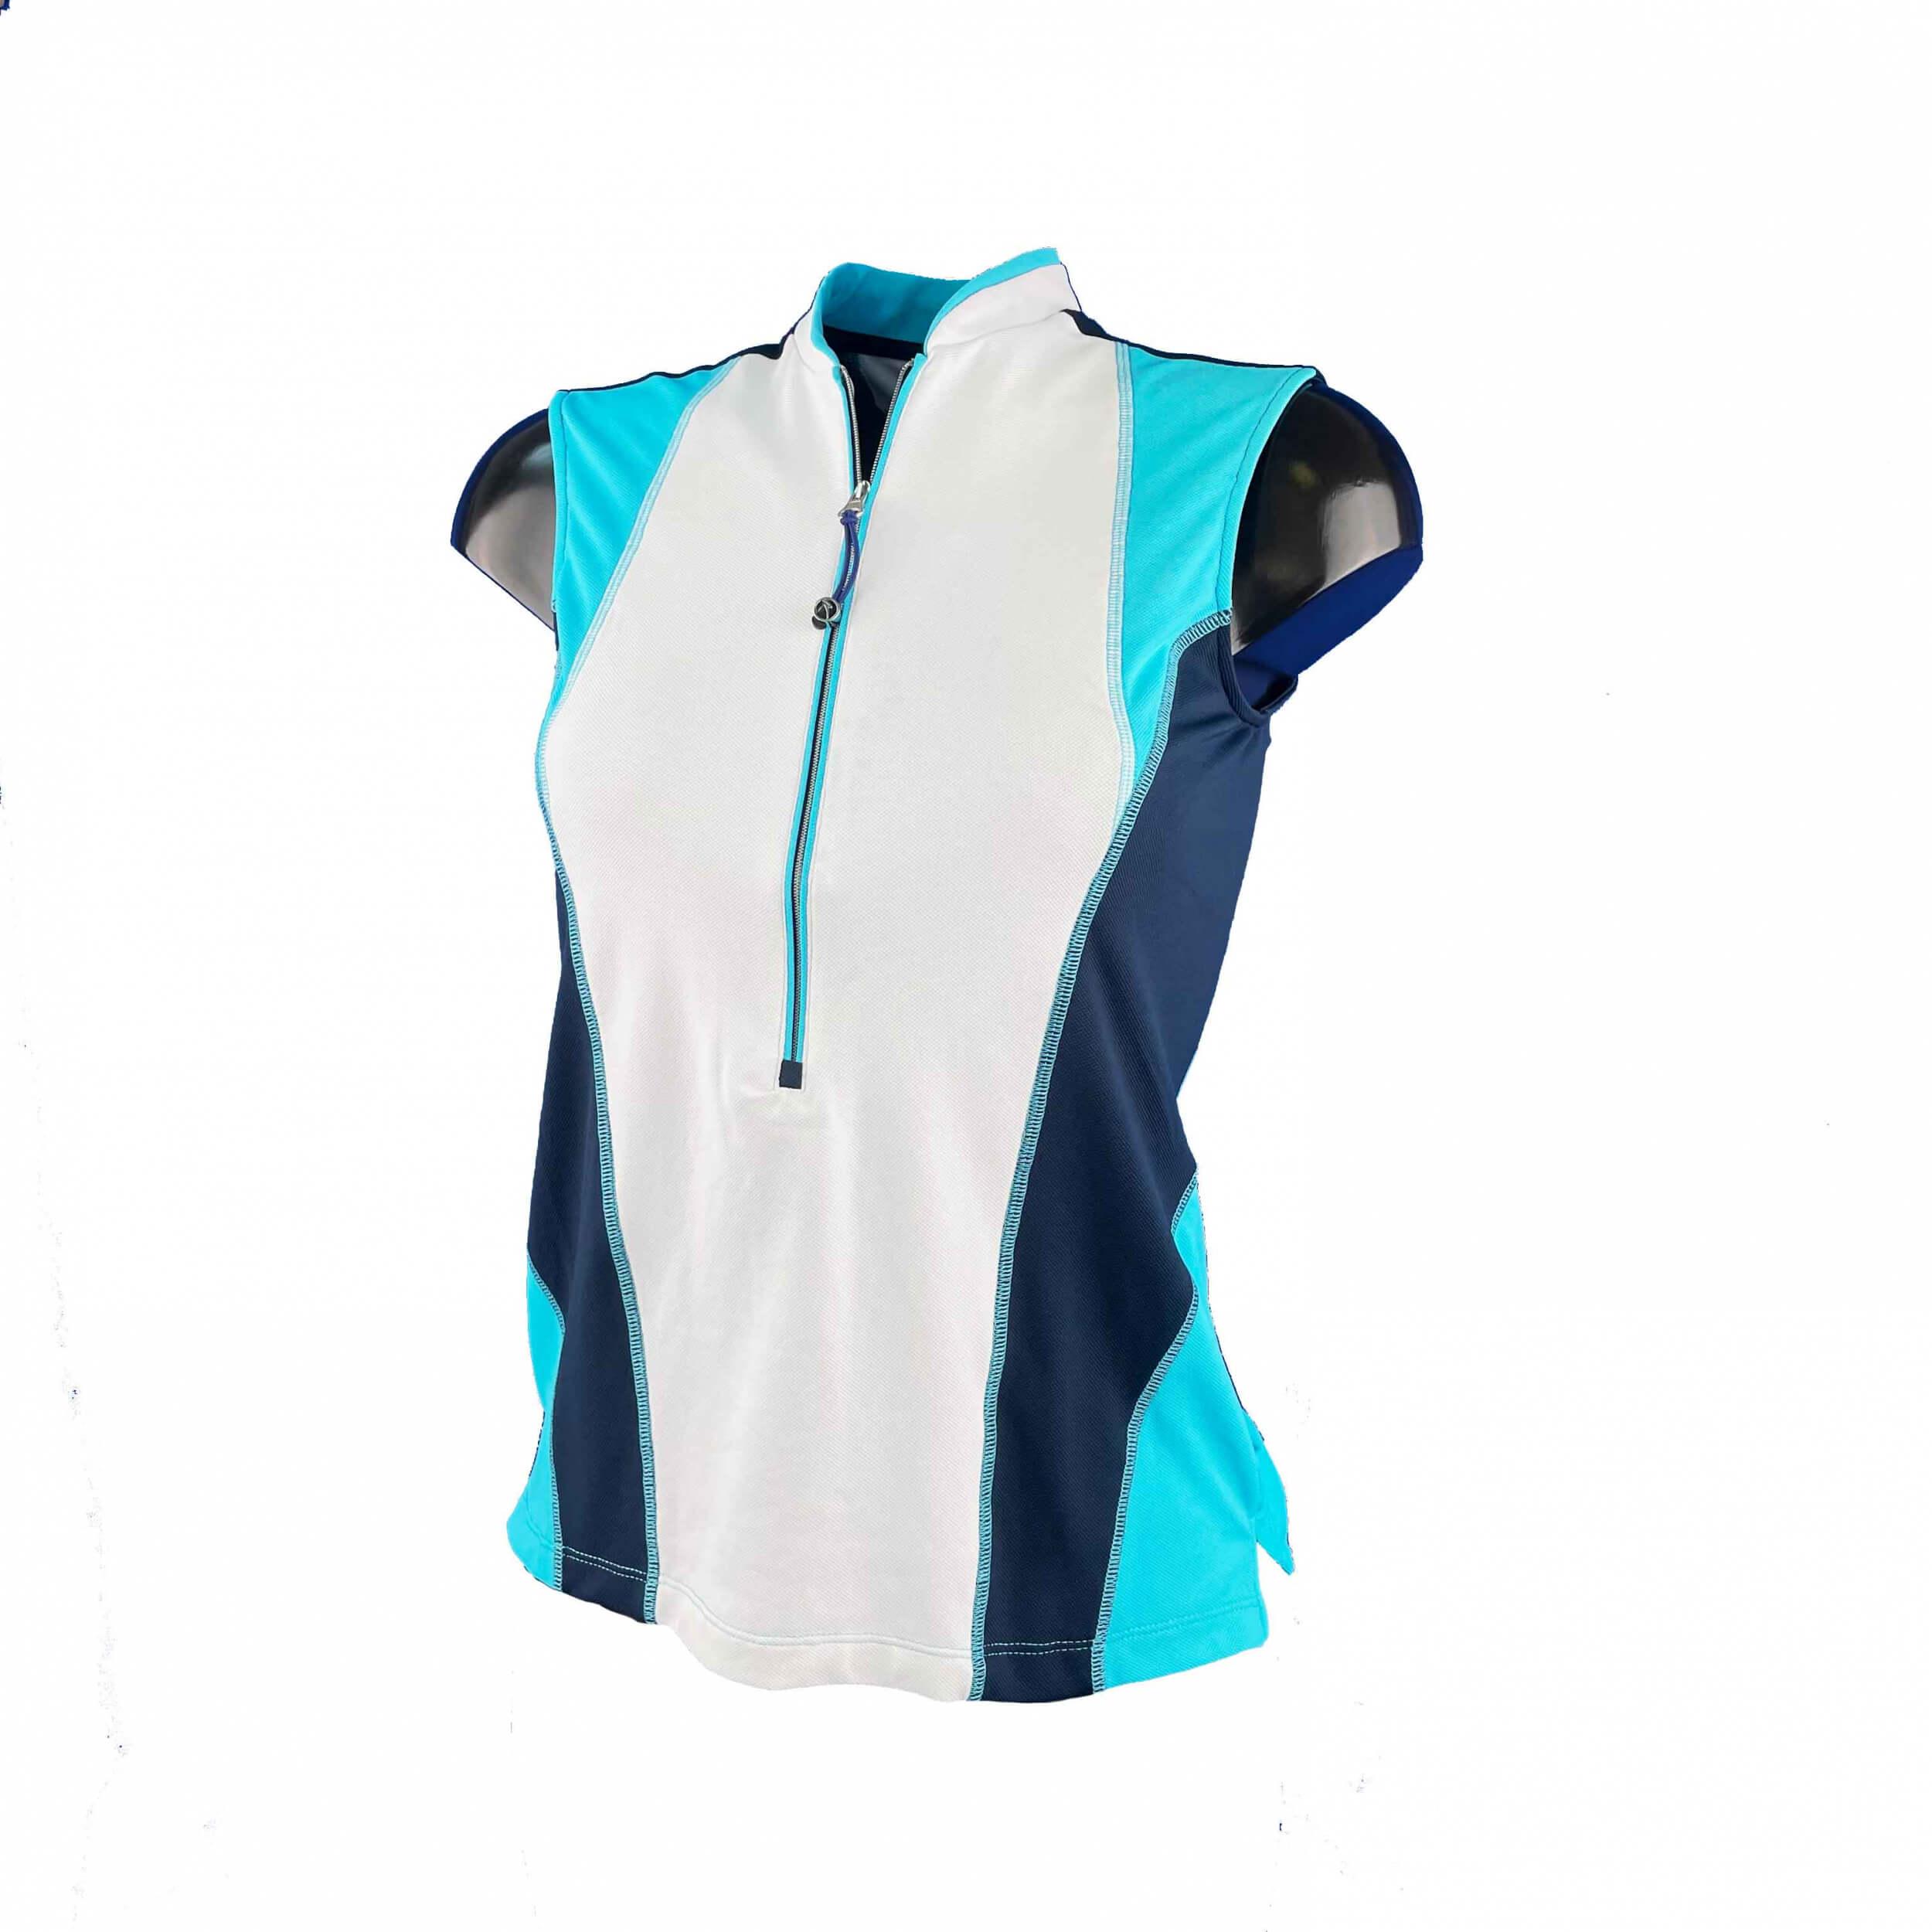 Chervo Damen Polo Top Albizia DRY MATIC weiß blau A38 2.Wahl